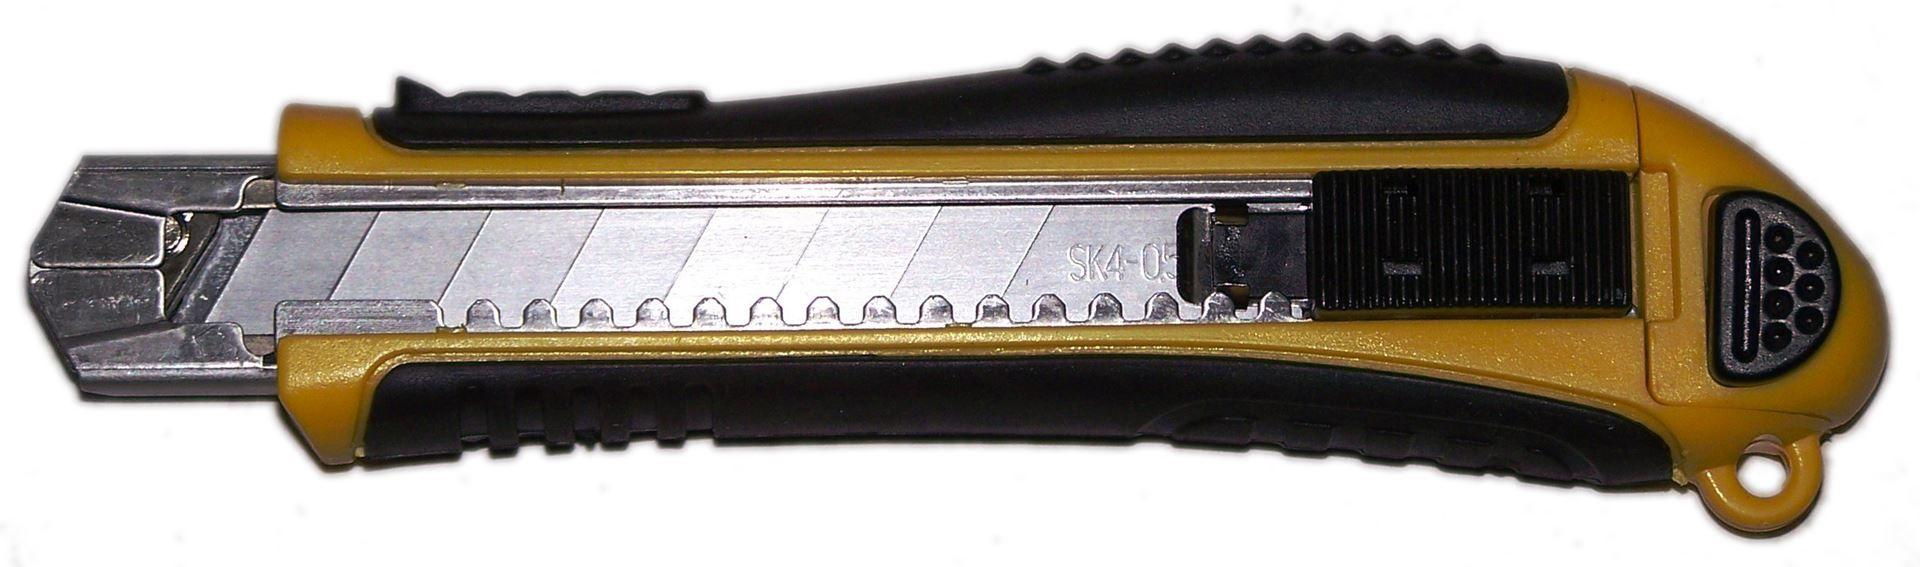 Nóż do tapet 18mm 5-ostrzy DREL